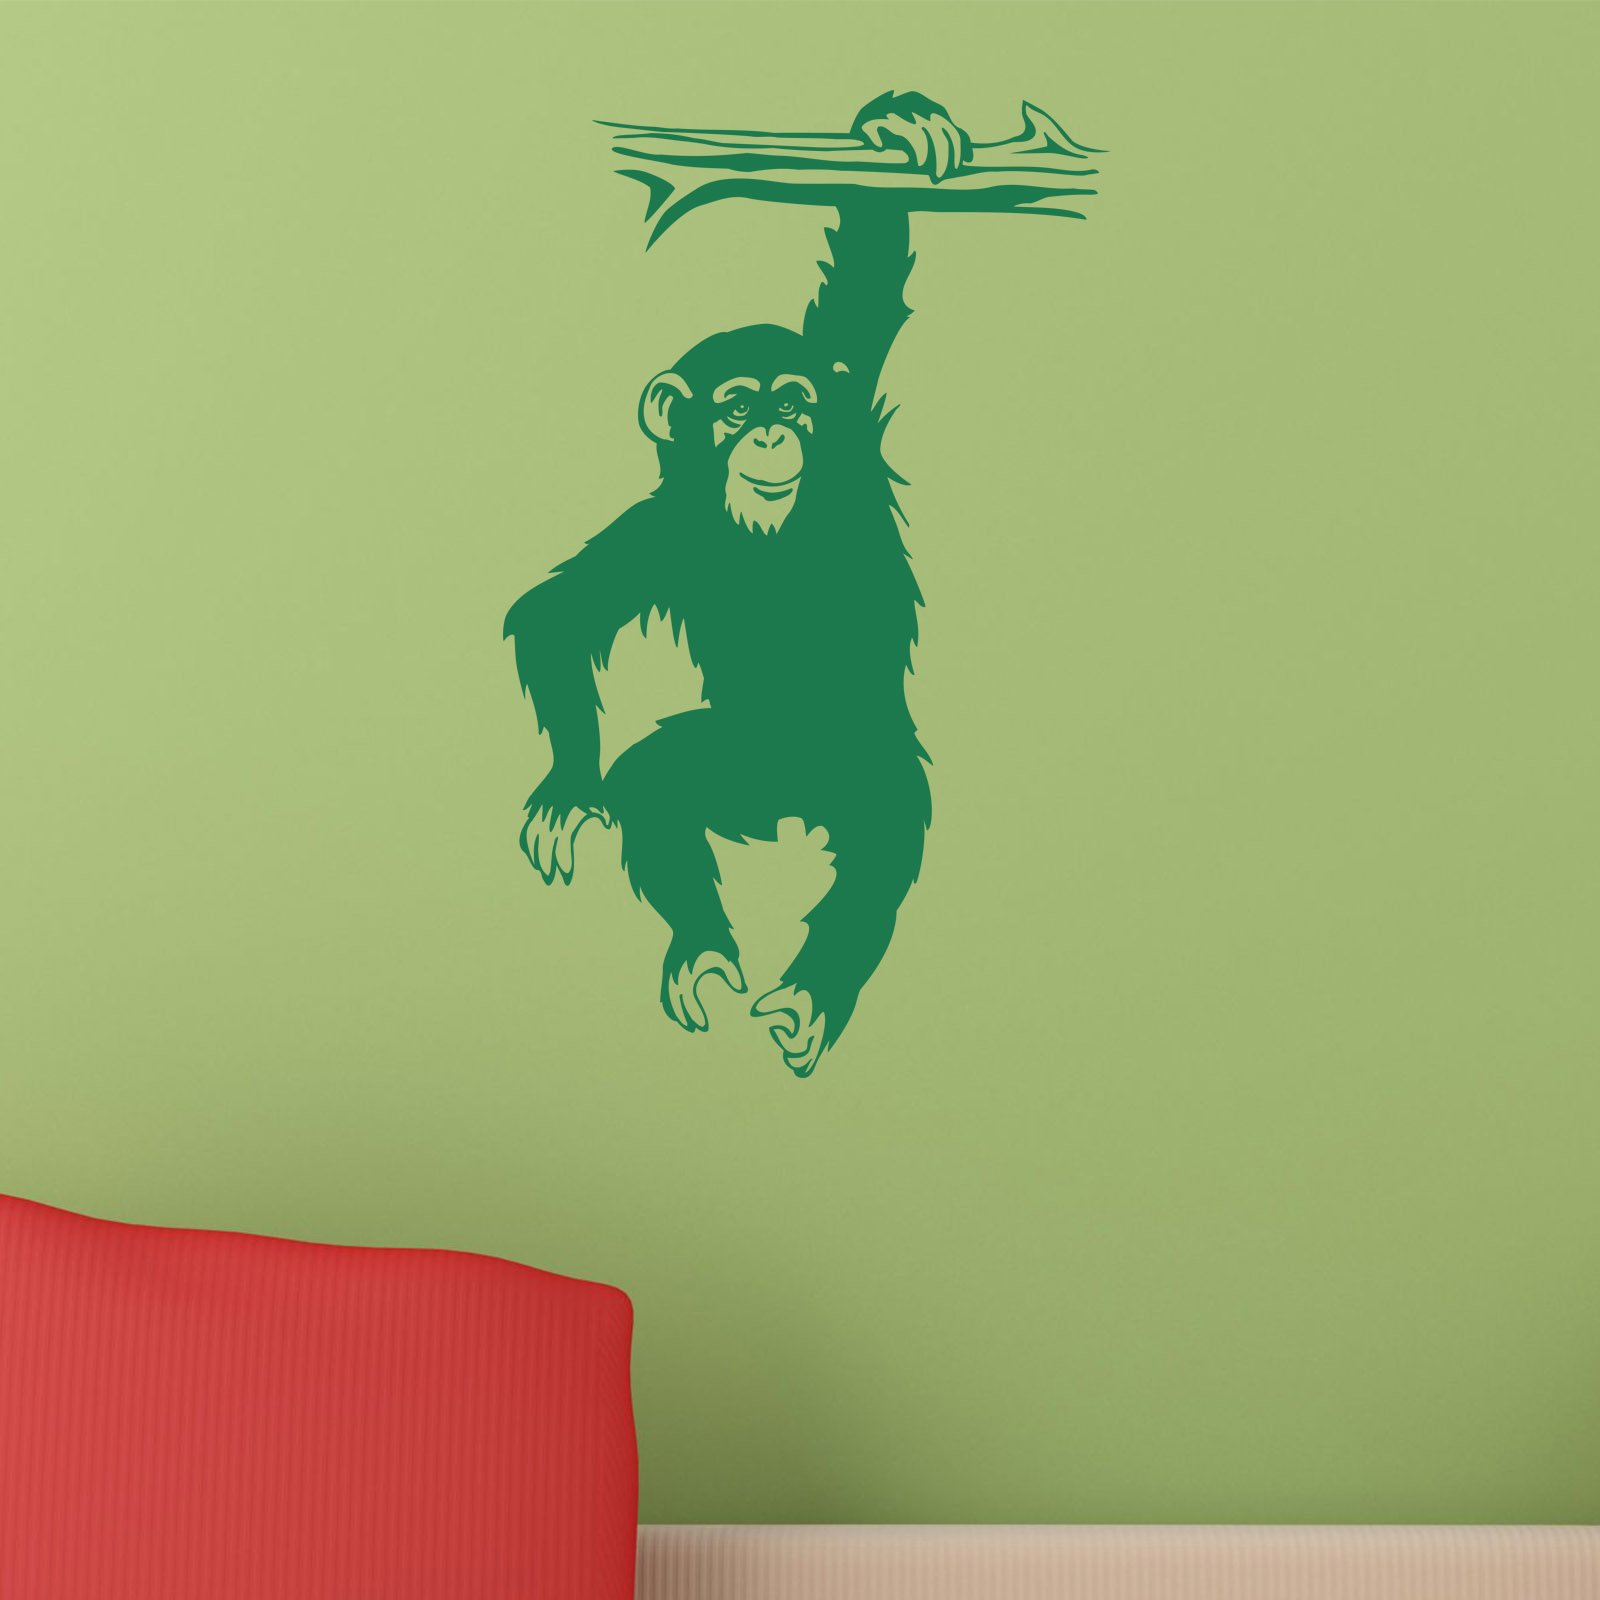 monkey hanging from branch chimp ape animal wall sticker world monkey hanging from branch chimp ape animal wall sticker world of wall stickers